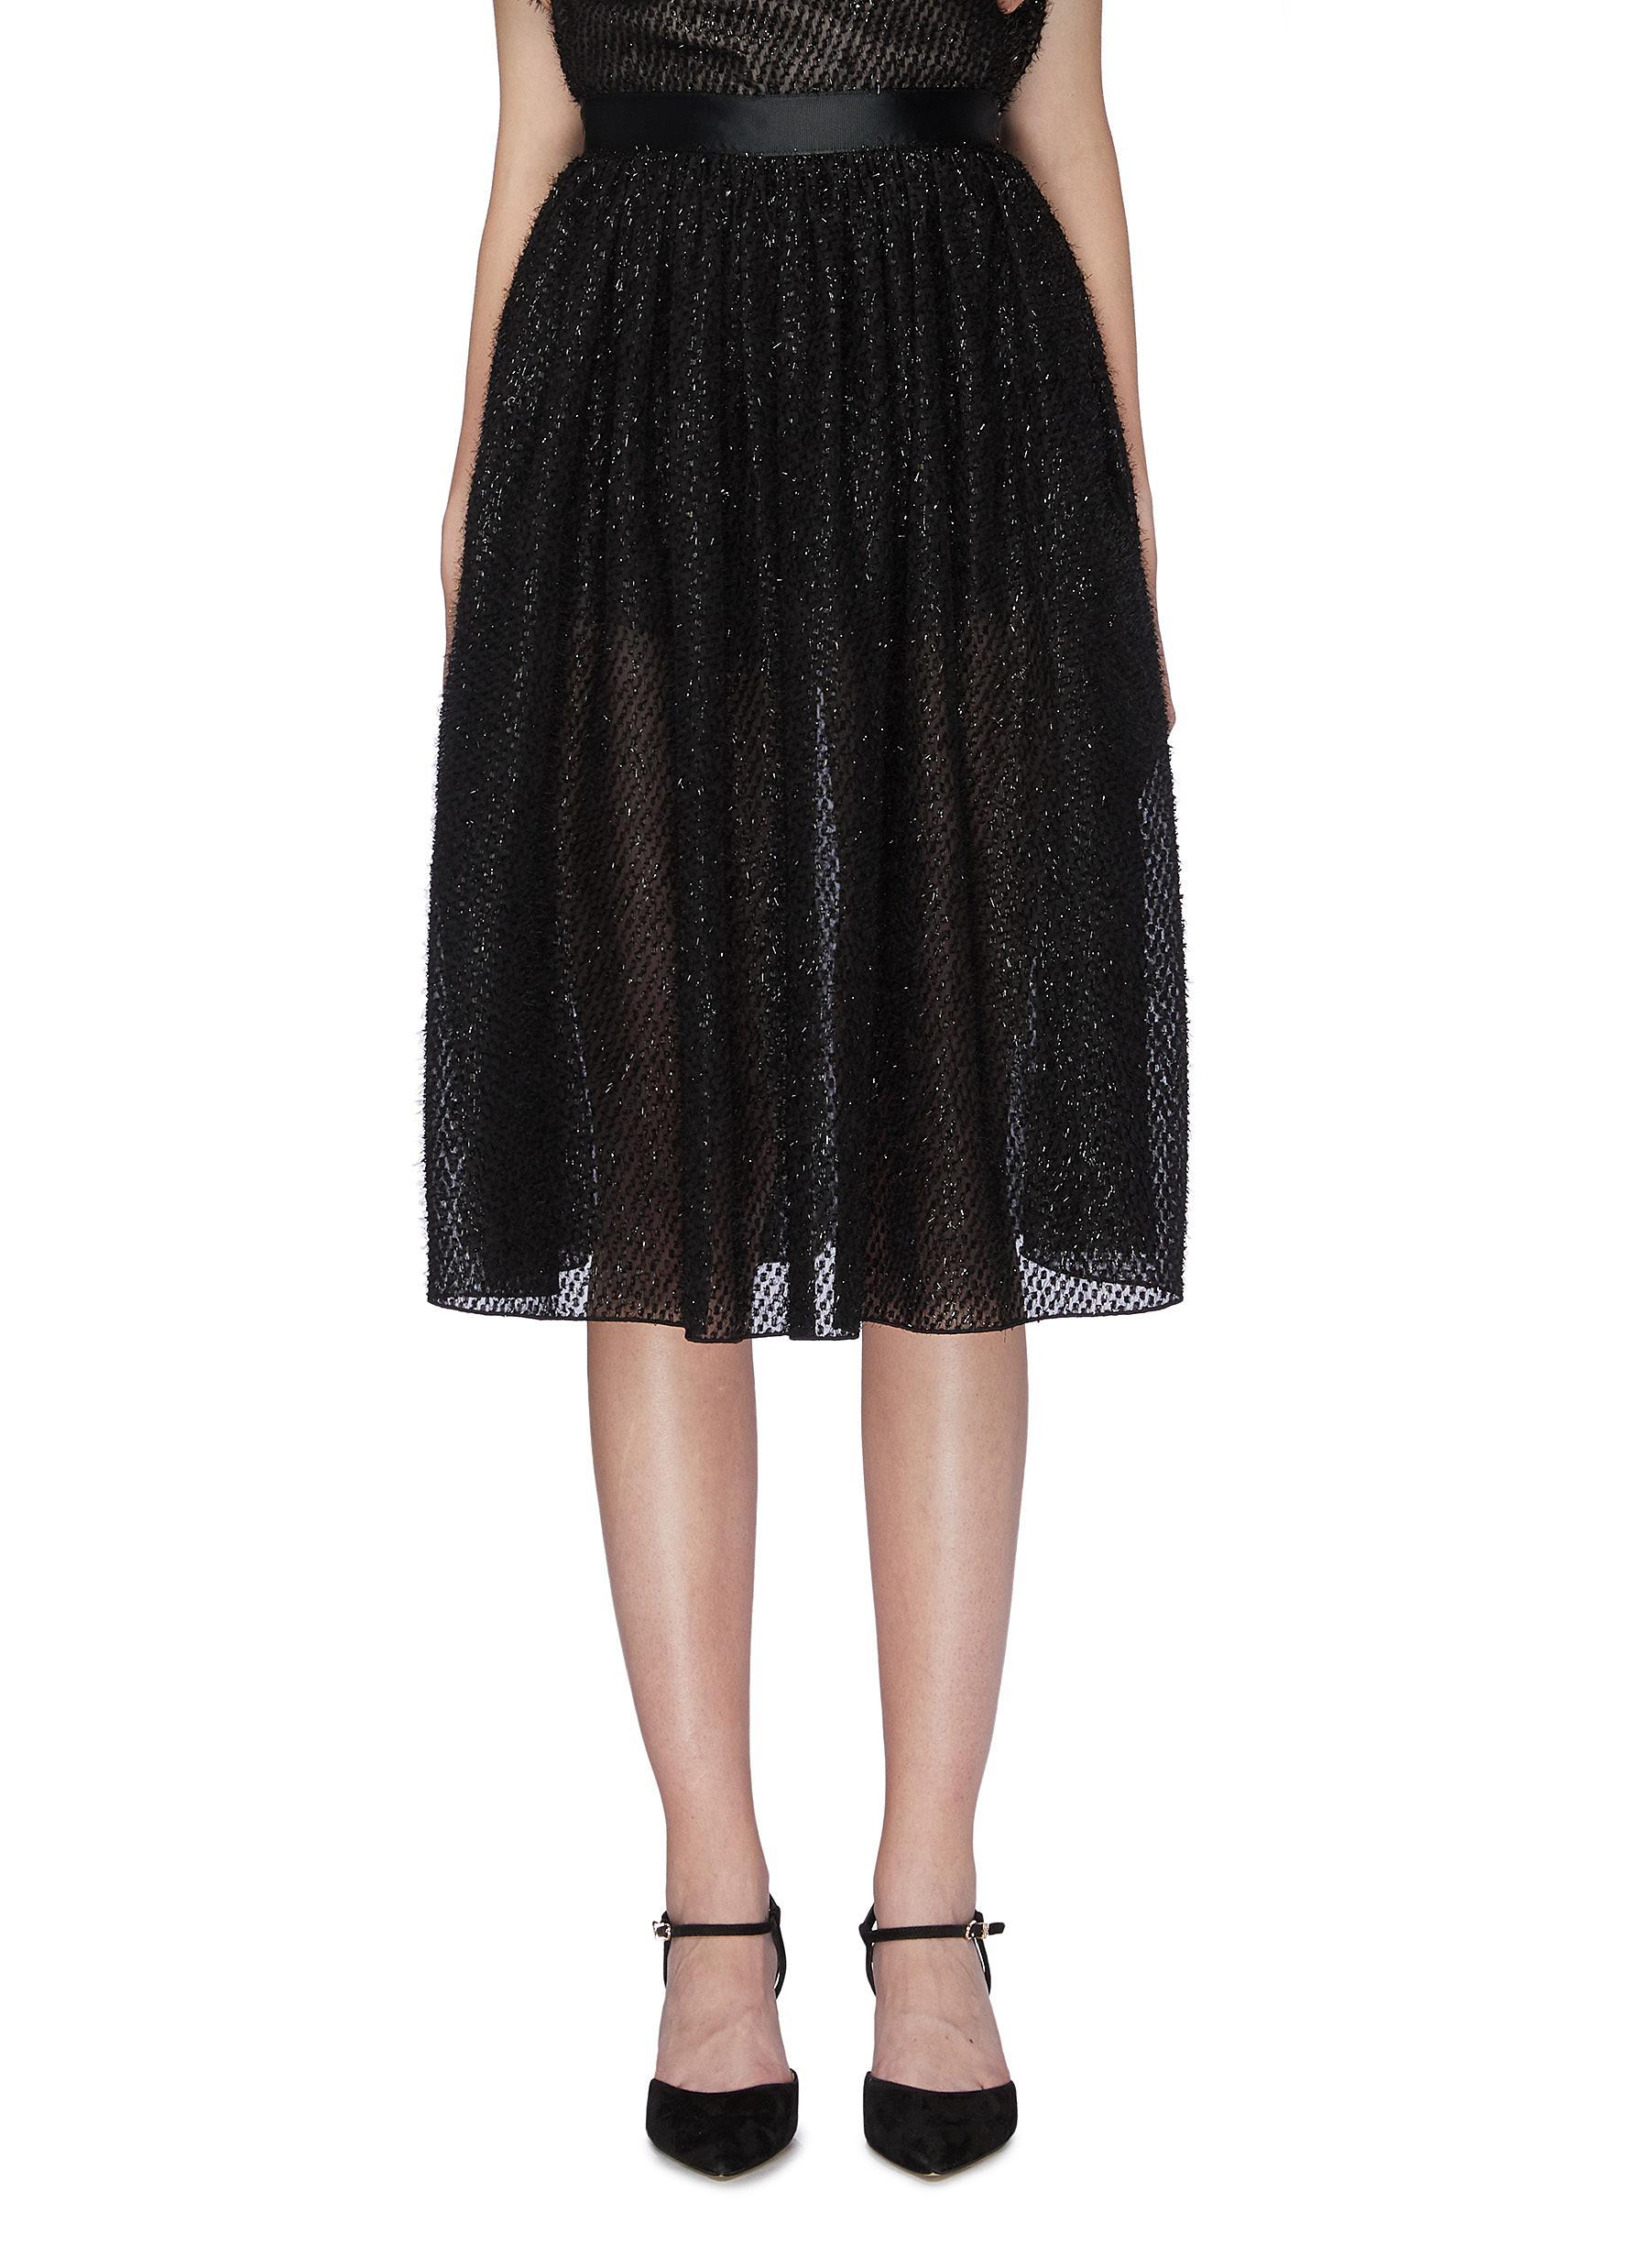 Metallic fil coupé skirt by Jonathan Liang